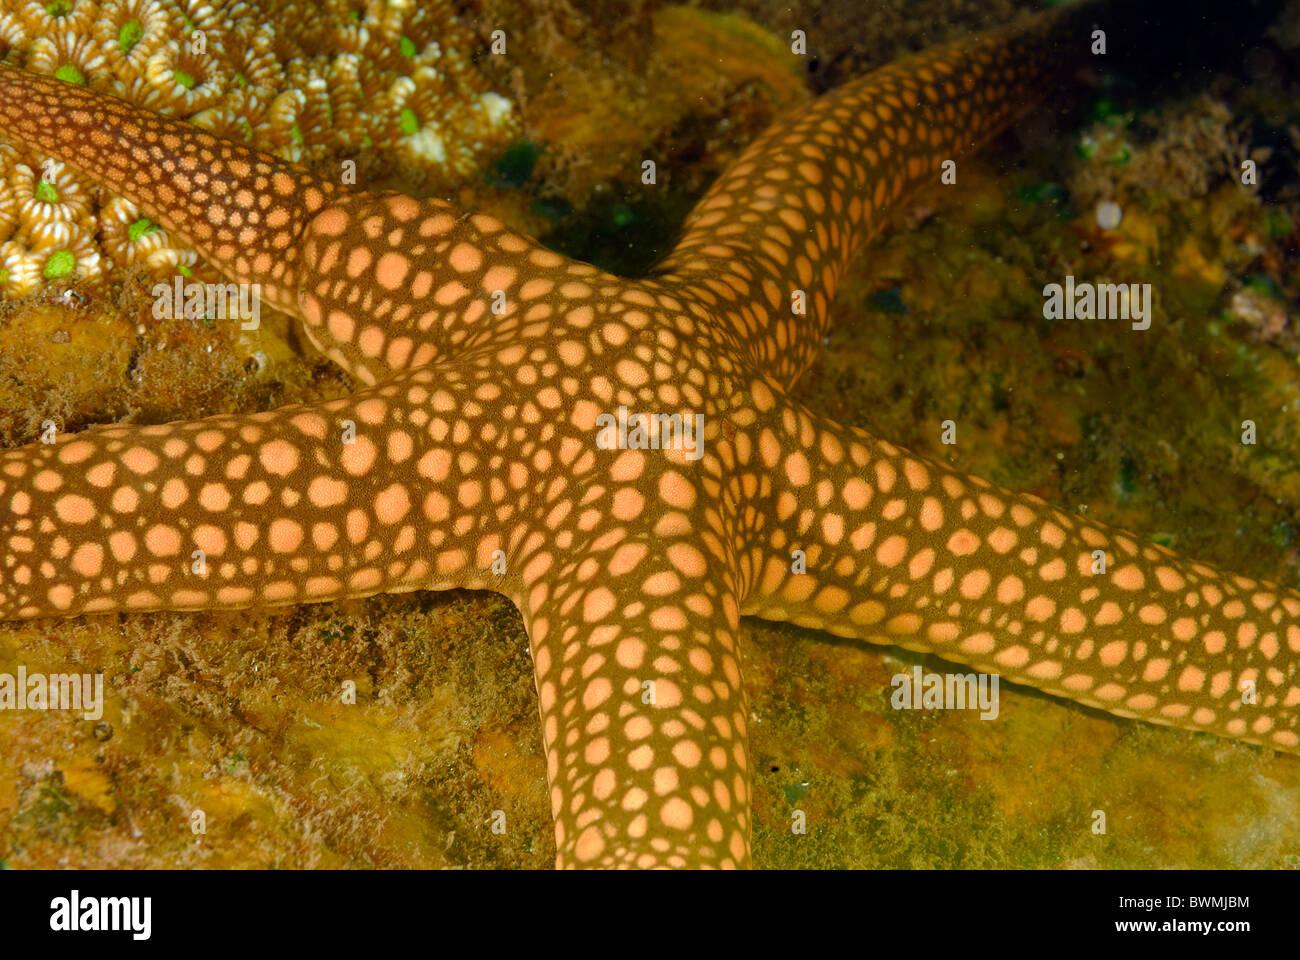 Yellow mesh sea star Nardoa novaecaledoniae, Bali, Indonesia, Tulamben - Stock Image